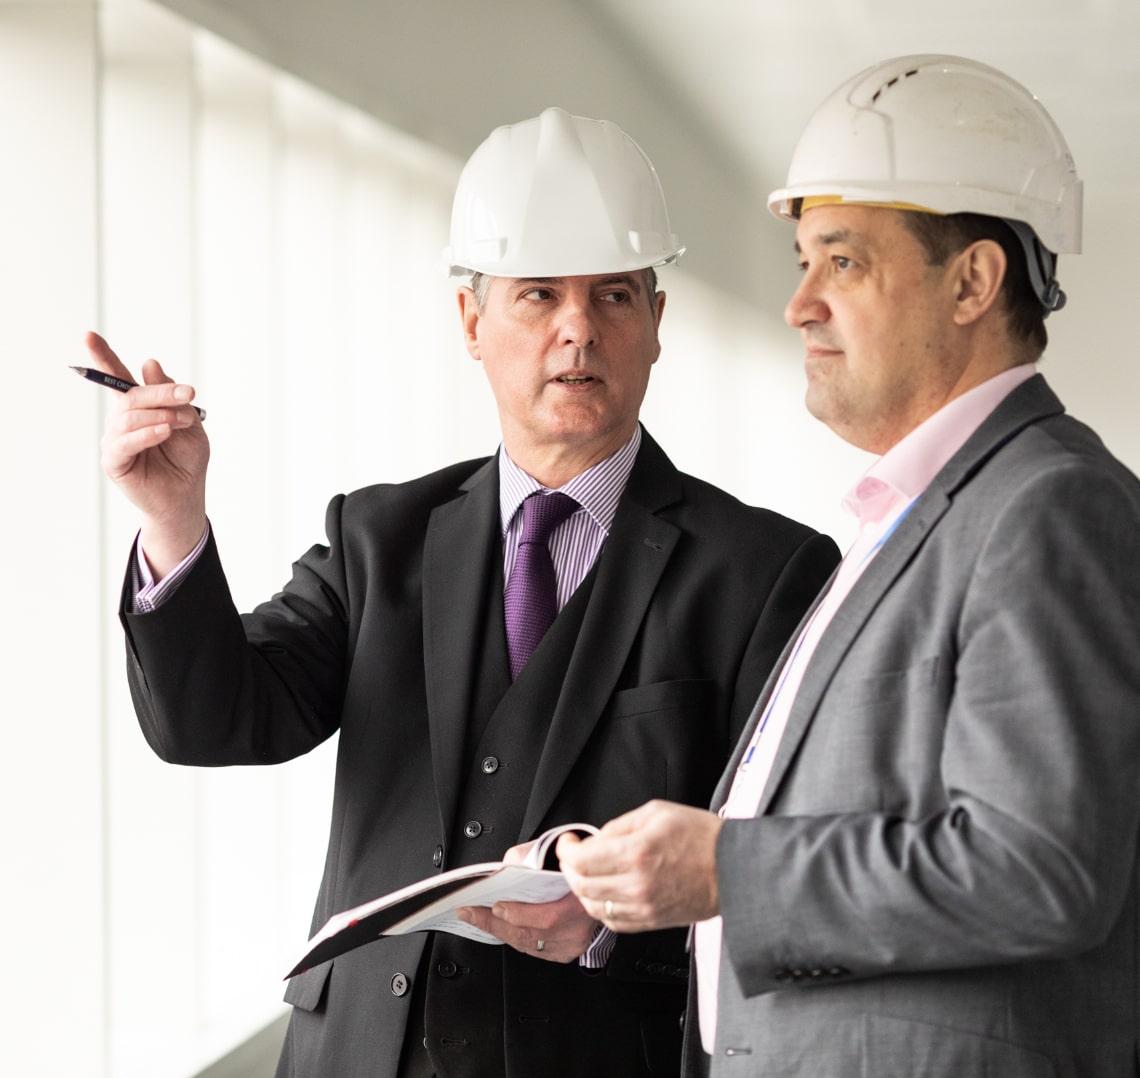 virtual-fm-about-us-facilities-management-4